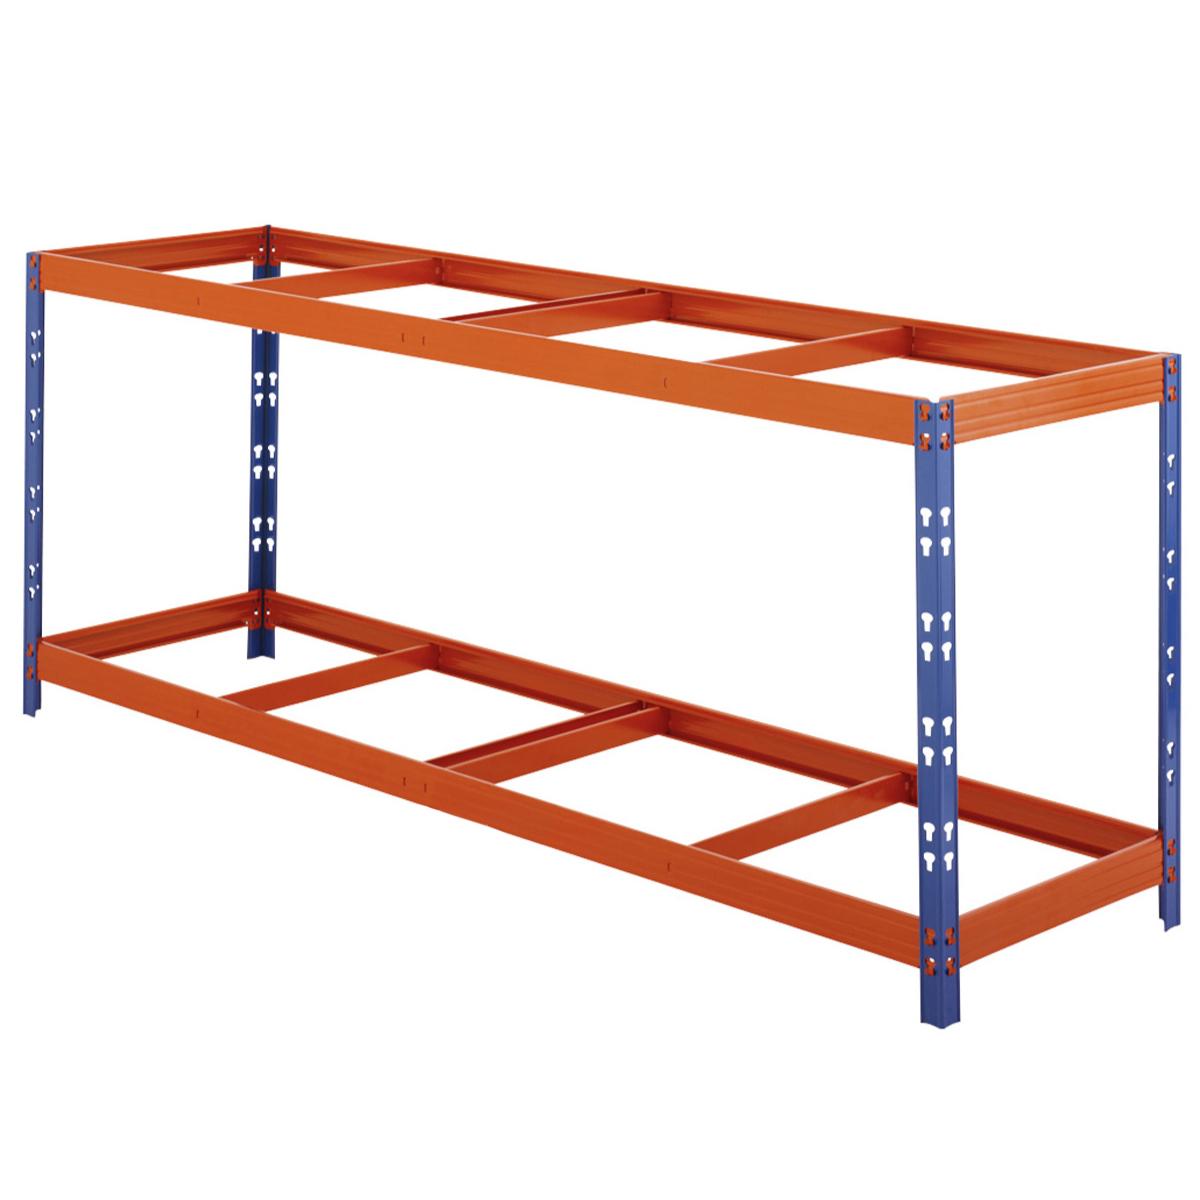 Workbench Heavy Duty Steel Only Work Bench Station Shelves Garage 900h Clearance Ebay